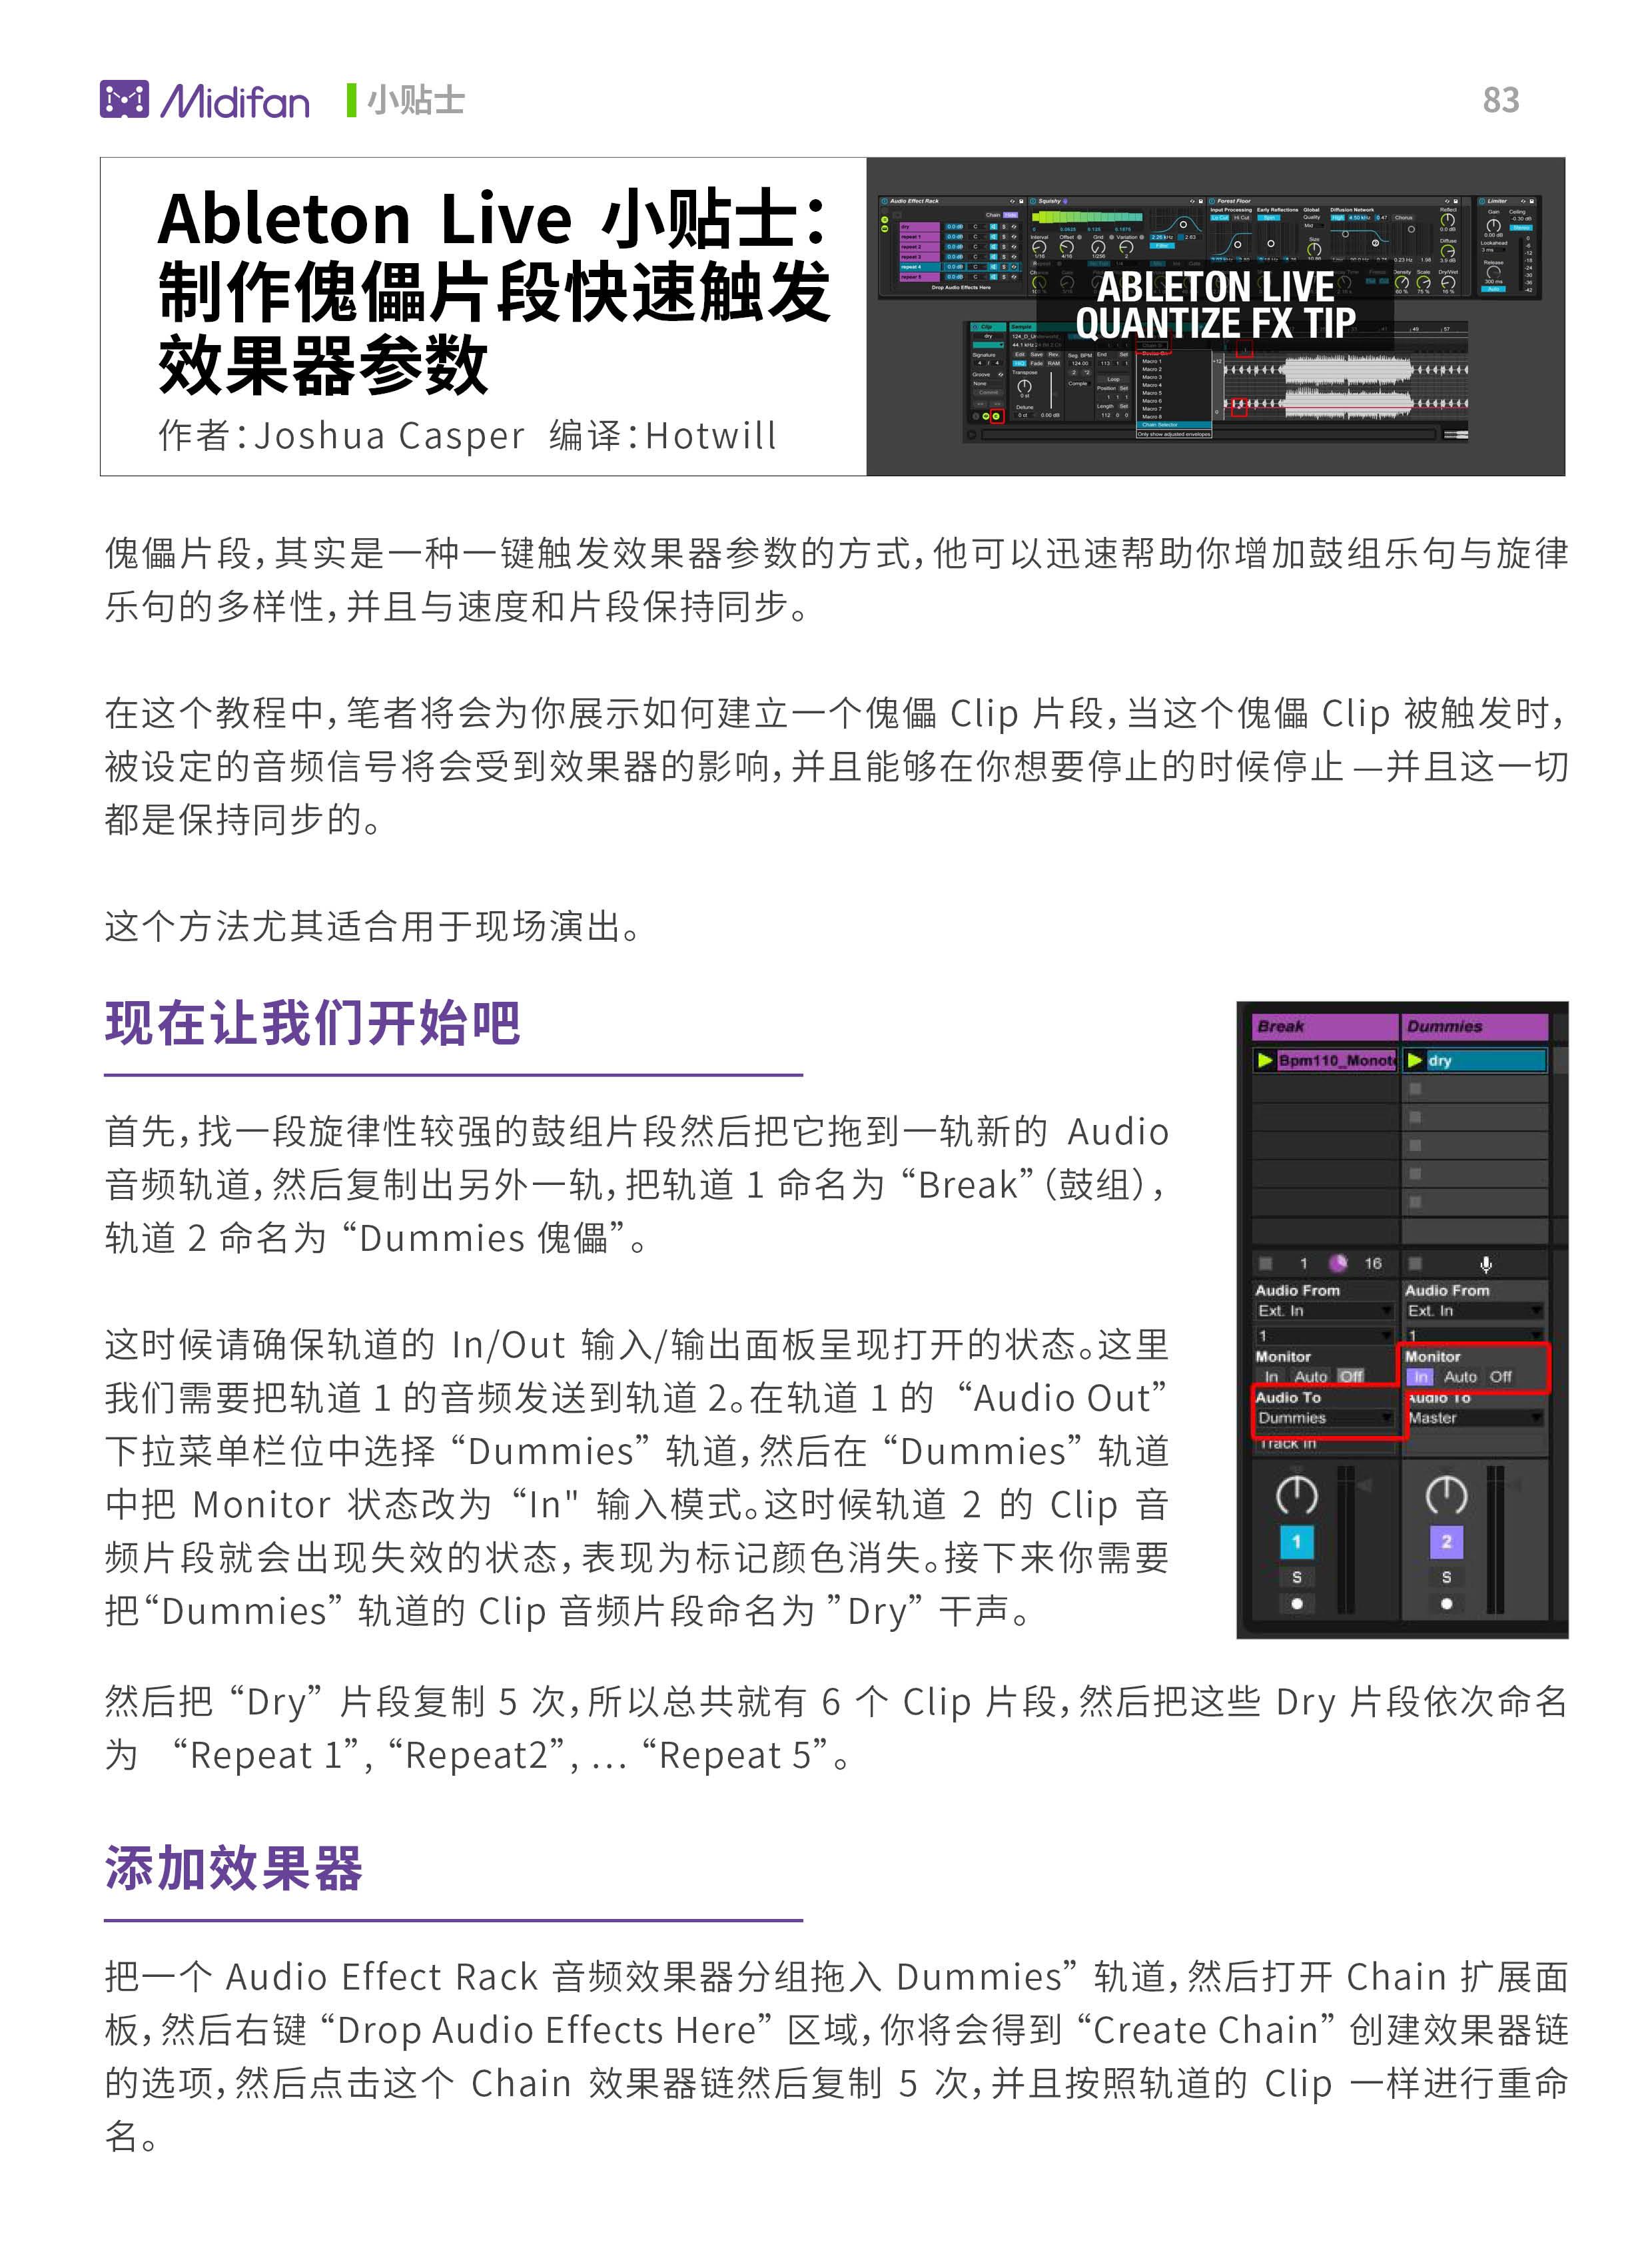 Ableton Live 小贴士:制作傀儡片段快速触发效果器参数- Midifan:我们